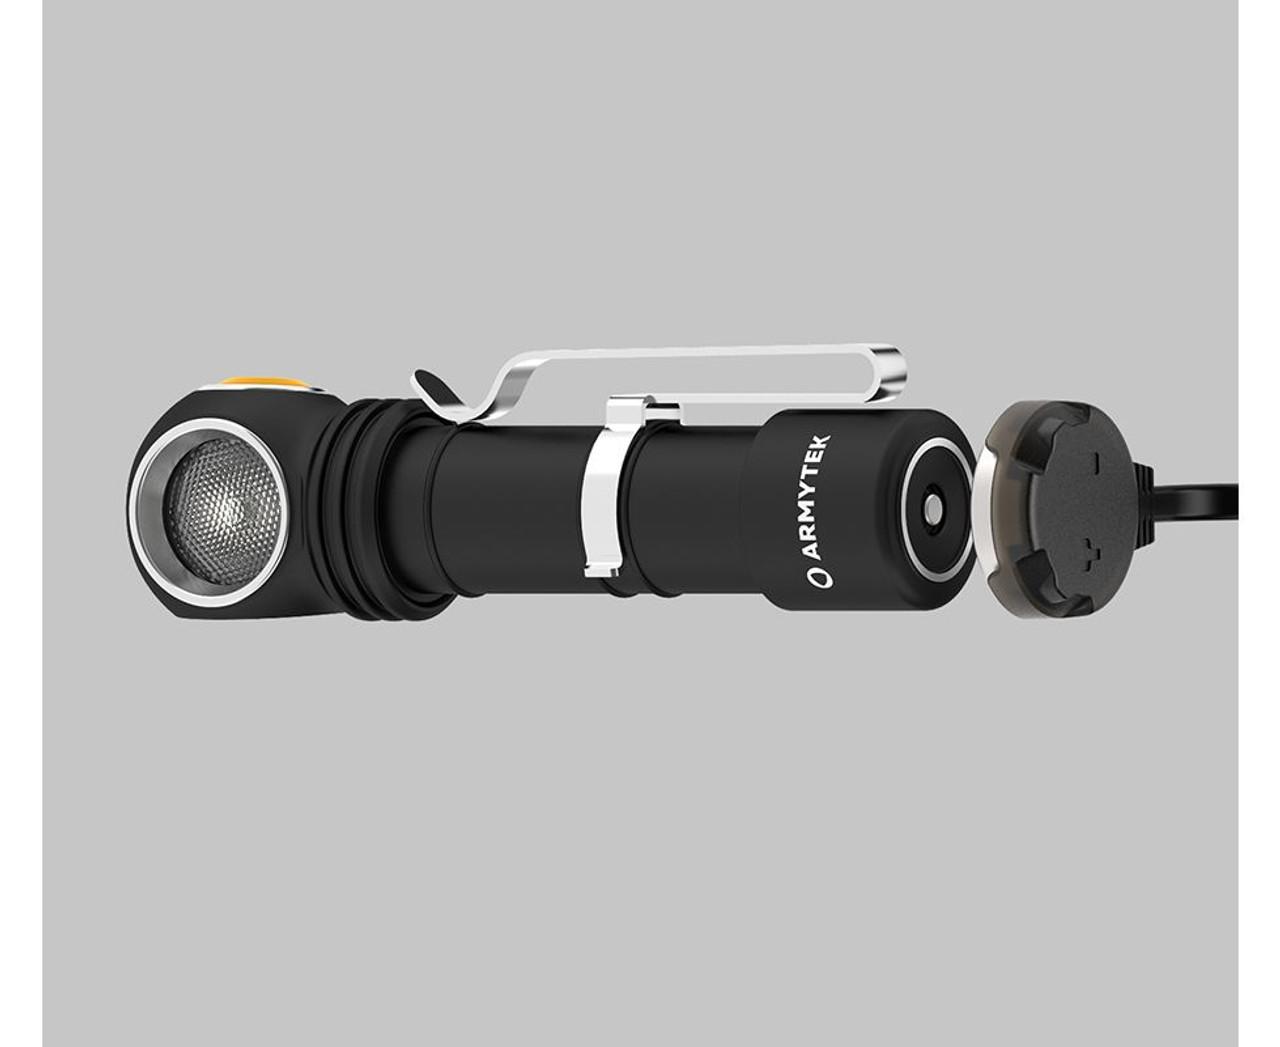 Armytek Wizard C2 Pro Multi Flashlight 2500 Lumen USB Rechargeable